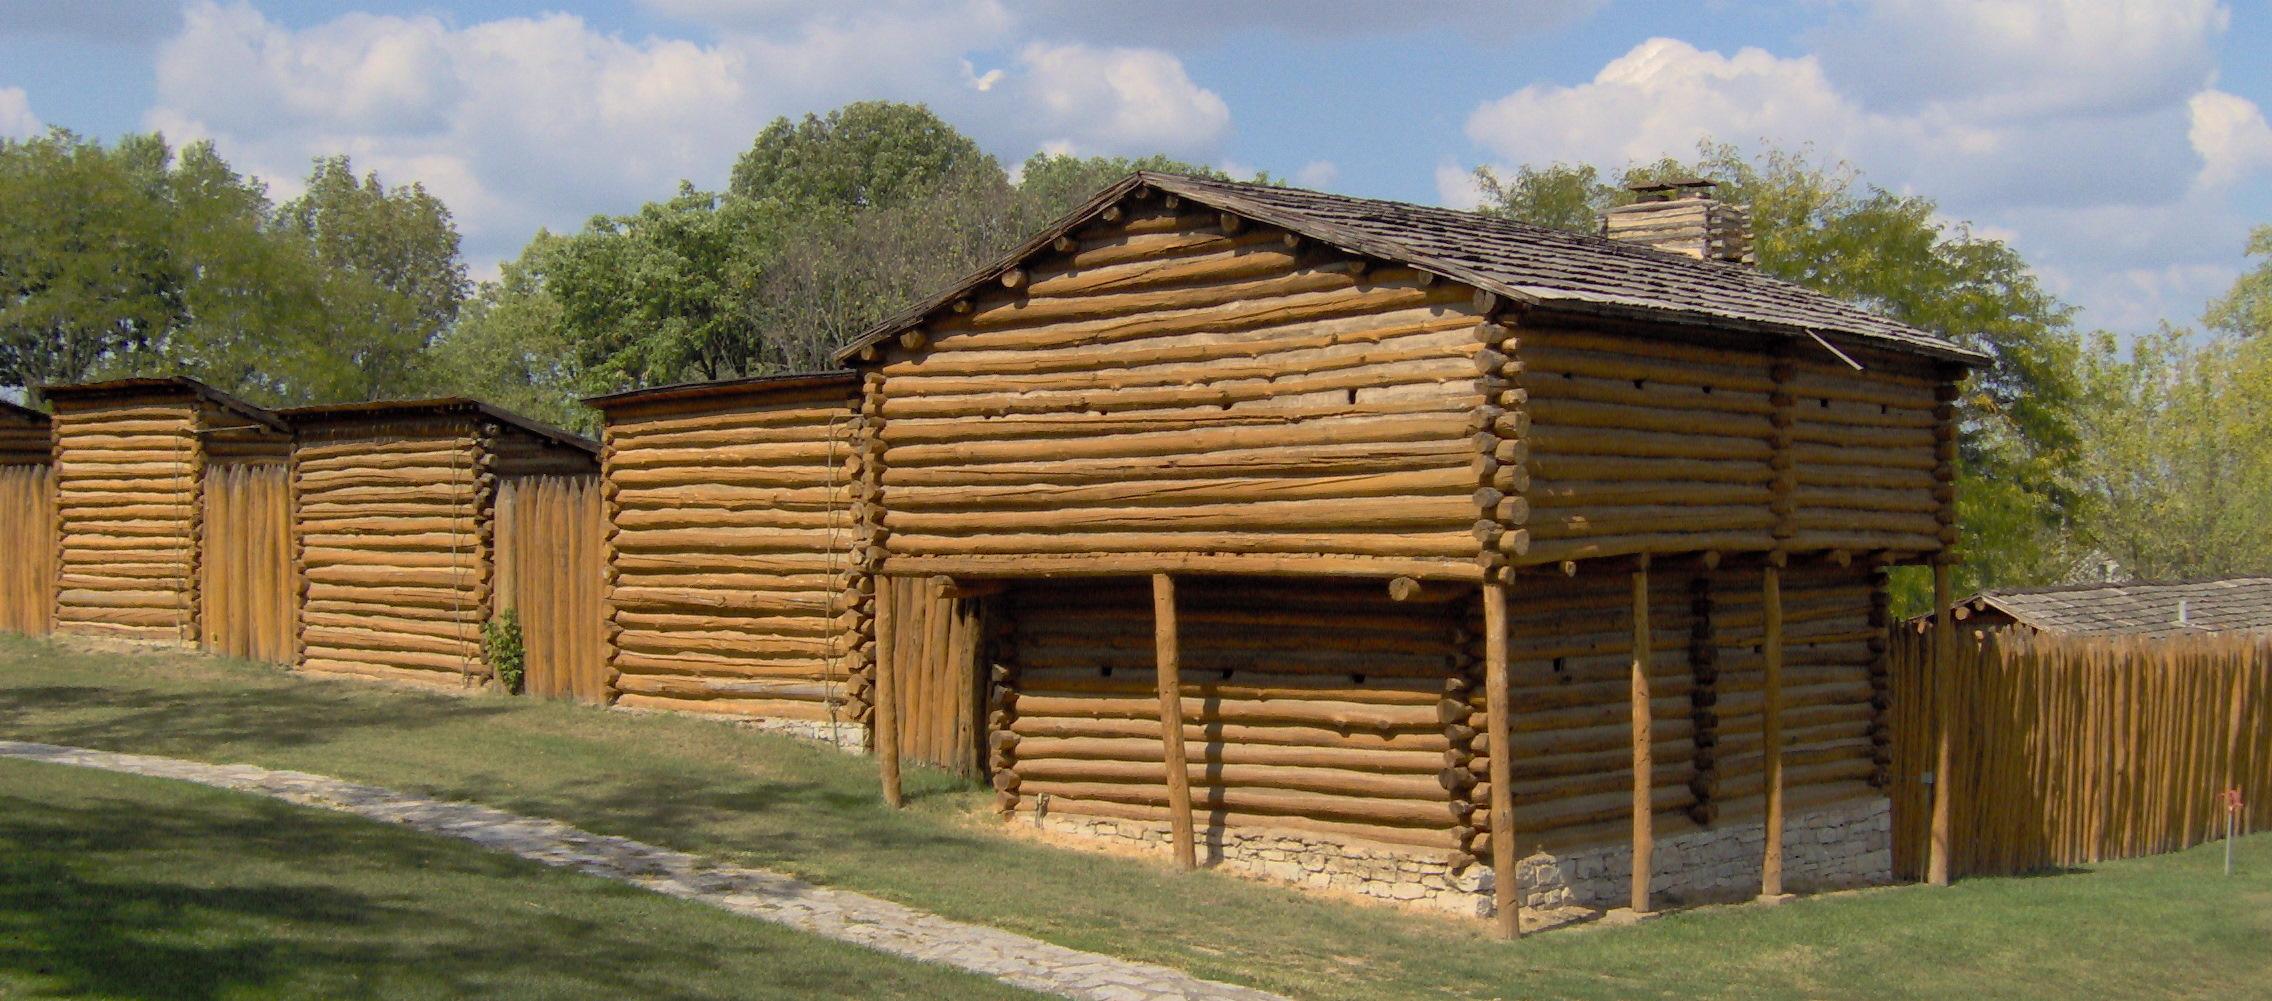 Old Fort Harrod State Park | Military Wiki | FANDOM powered